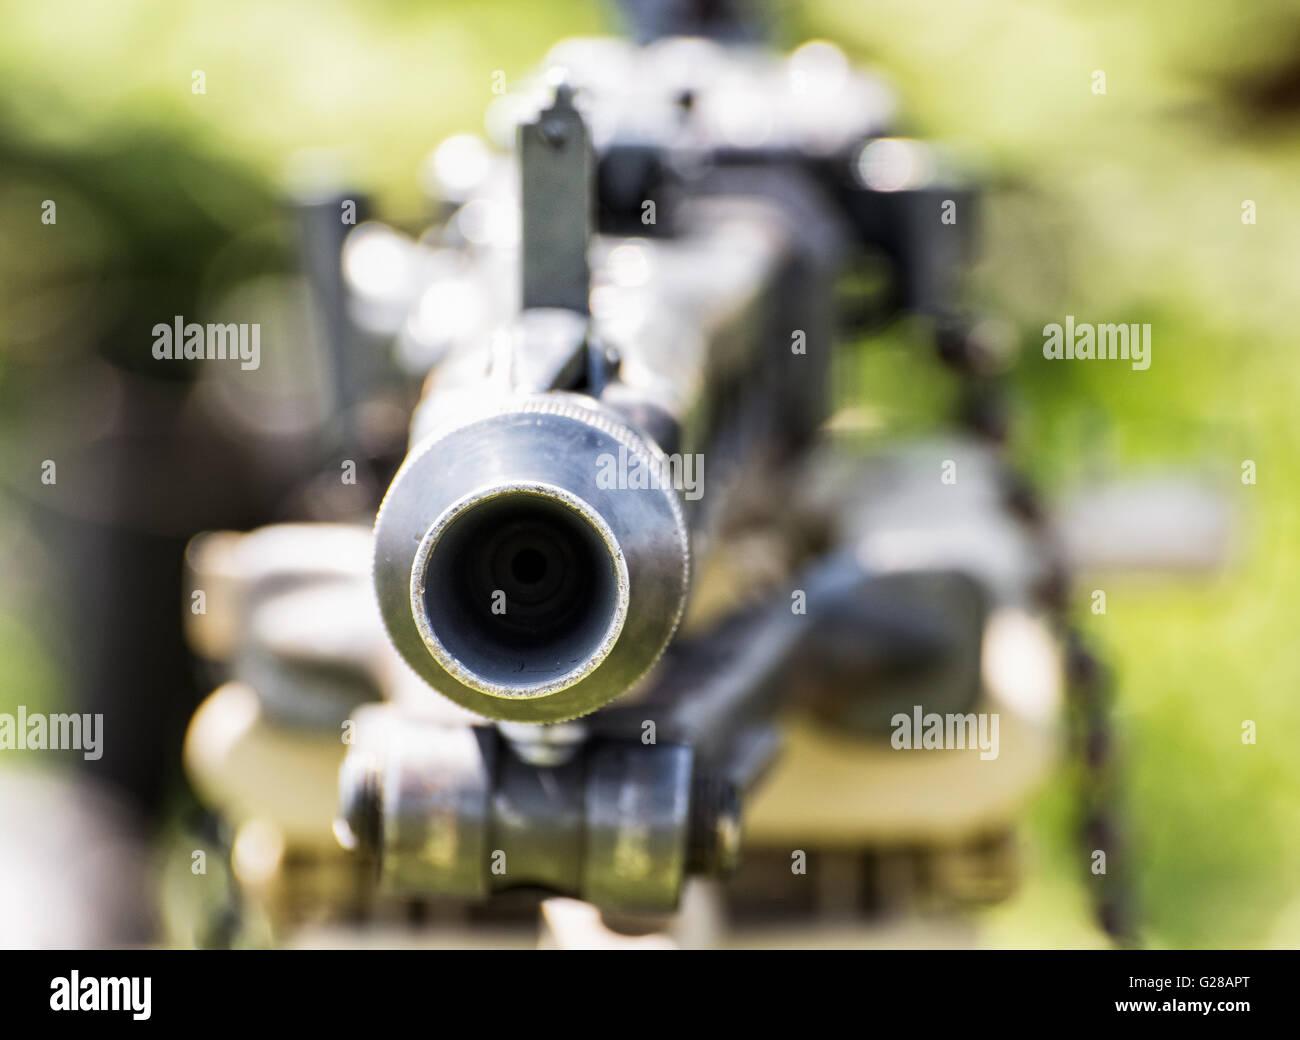 Close up photo of german historical machine gun of World War II. Ready to fire. War theme. Portable weapon. - Stock Image